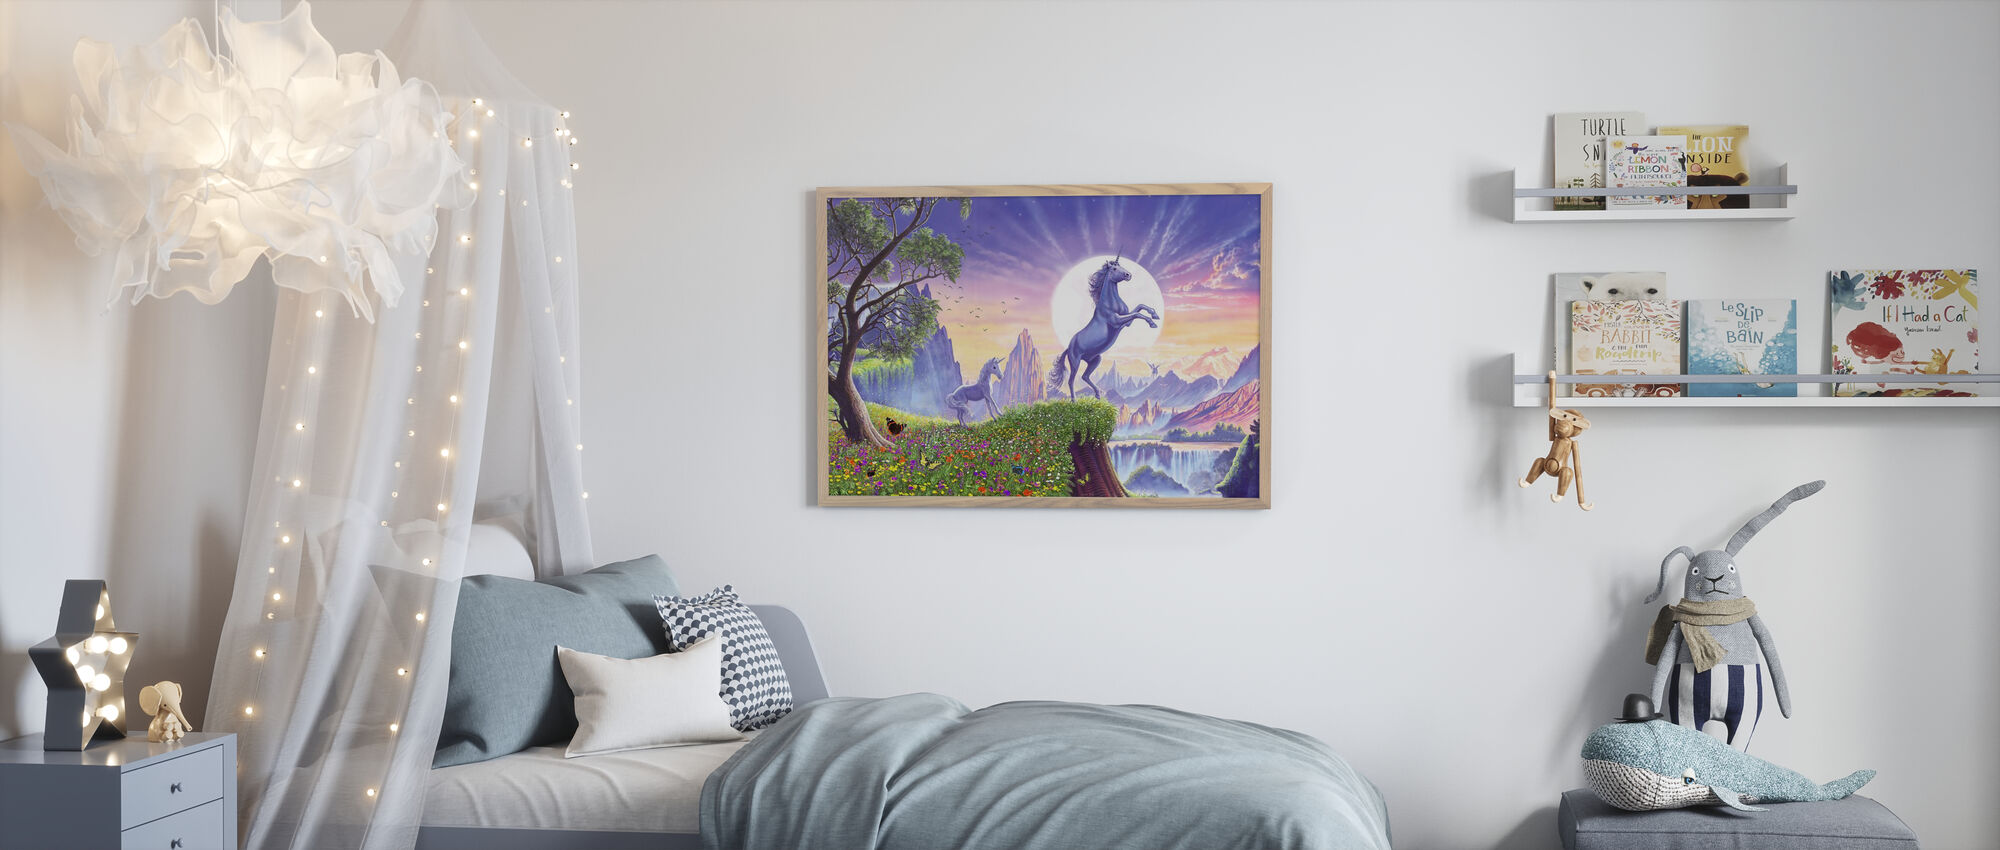 Enhjørning Månen Ravens - Plakat - Barnerom